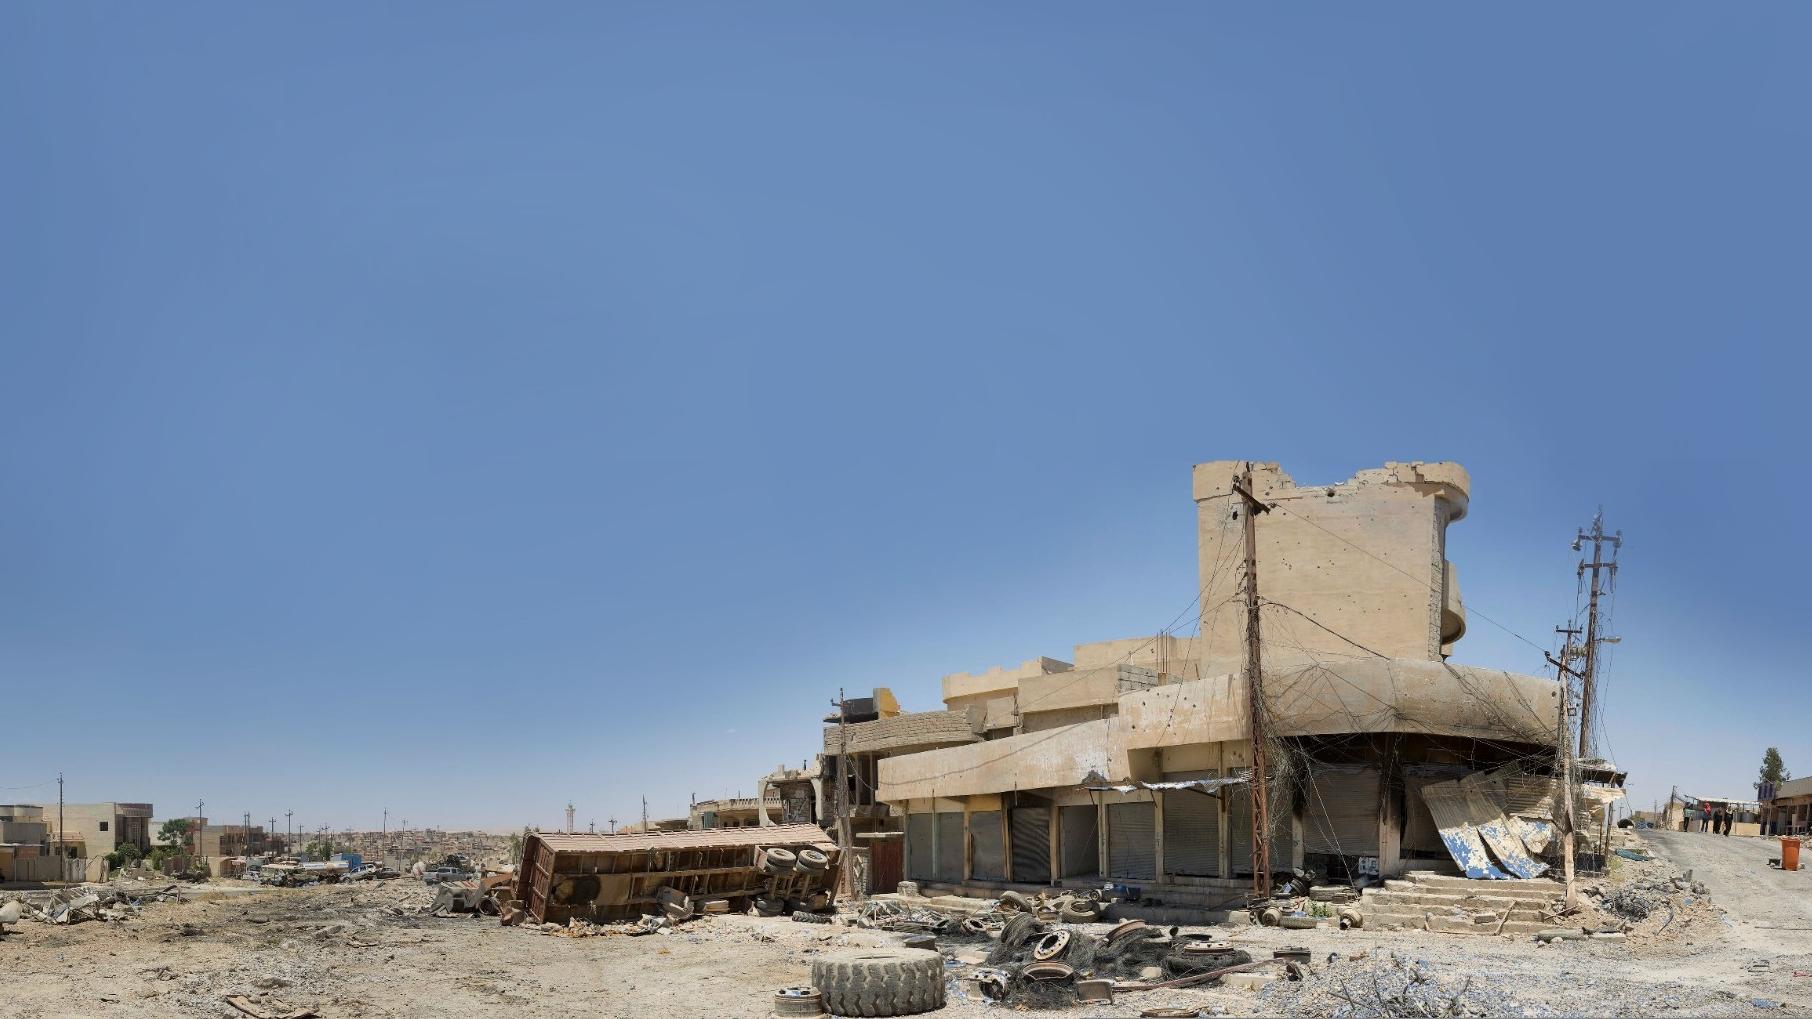 The extensive destruction of West Mosul, Iraq, June 2017